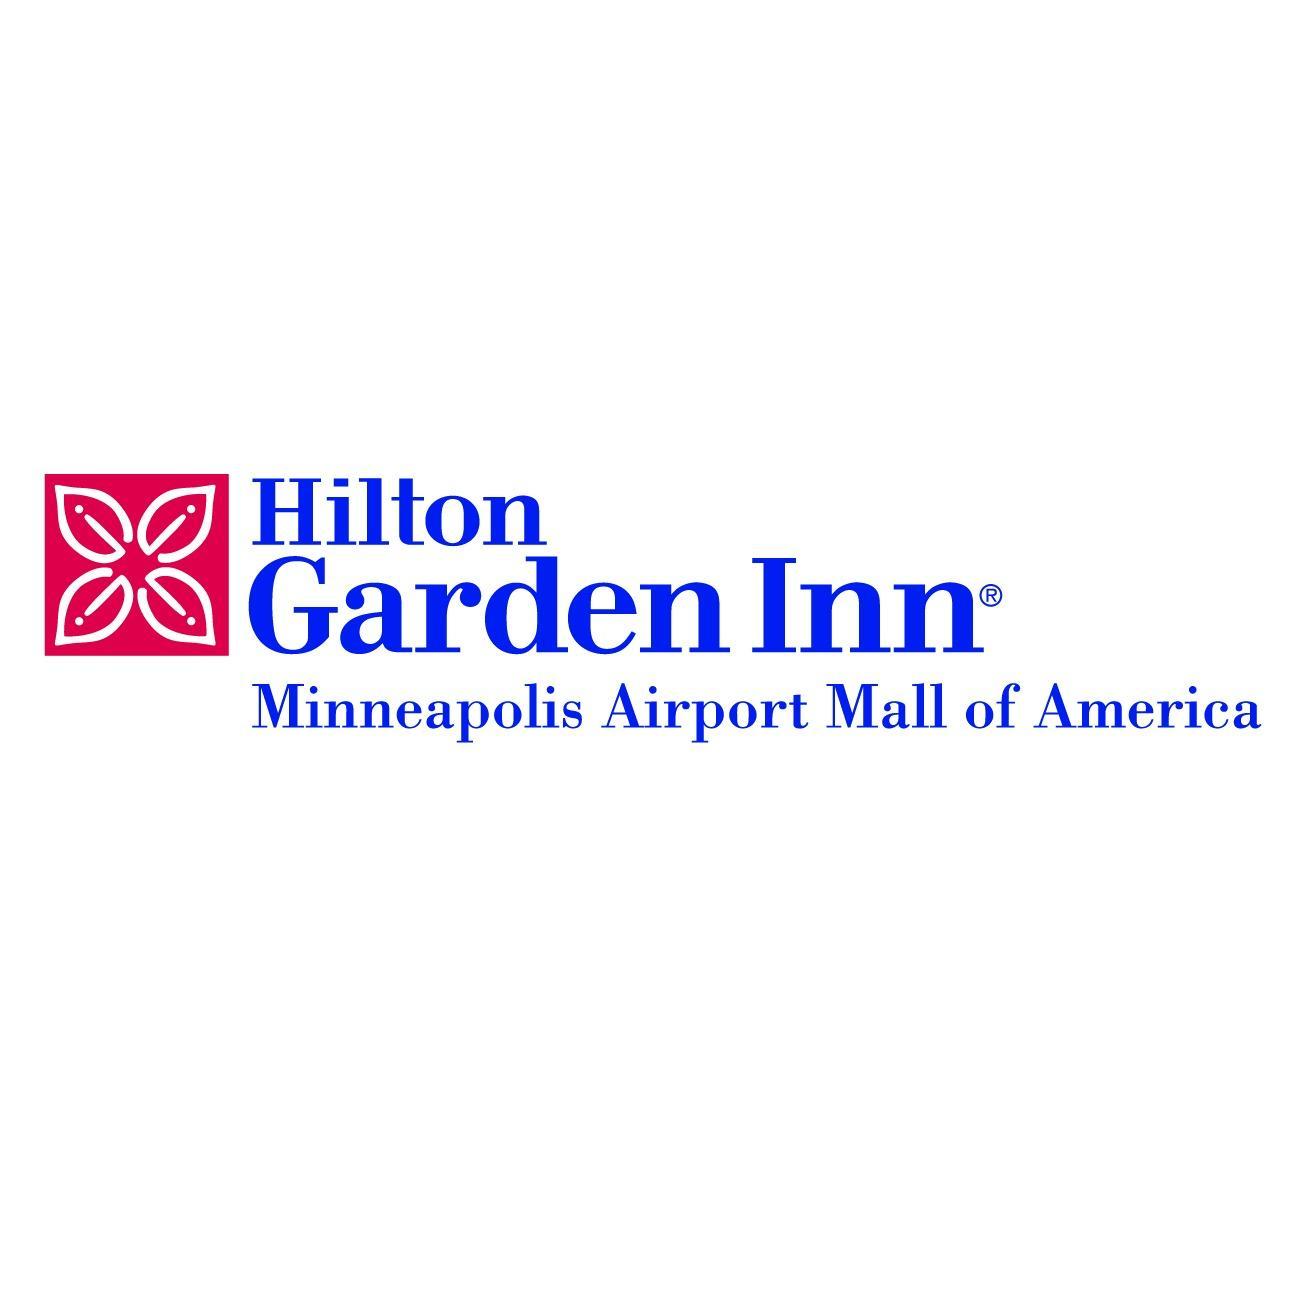 Hilton Garden Inn Minneapolis Airport Mall of America